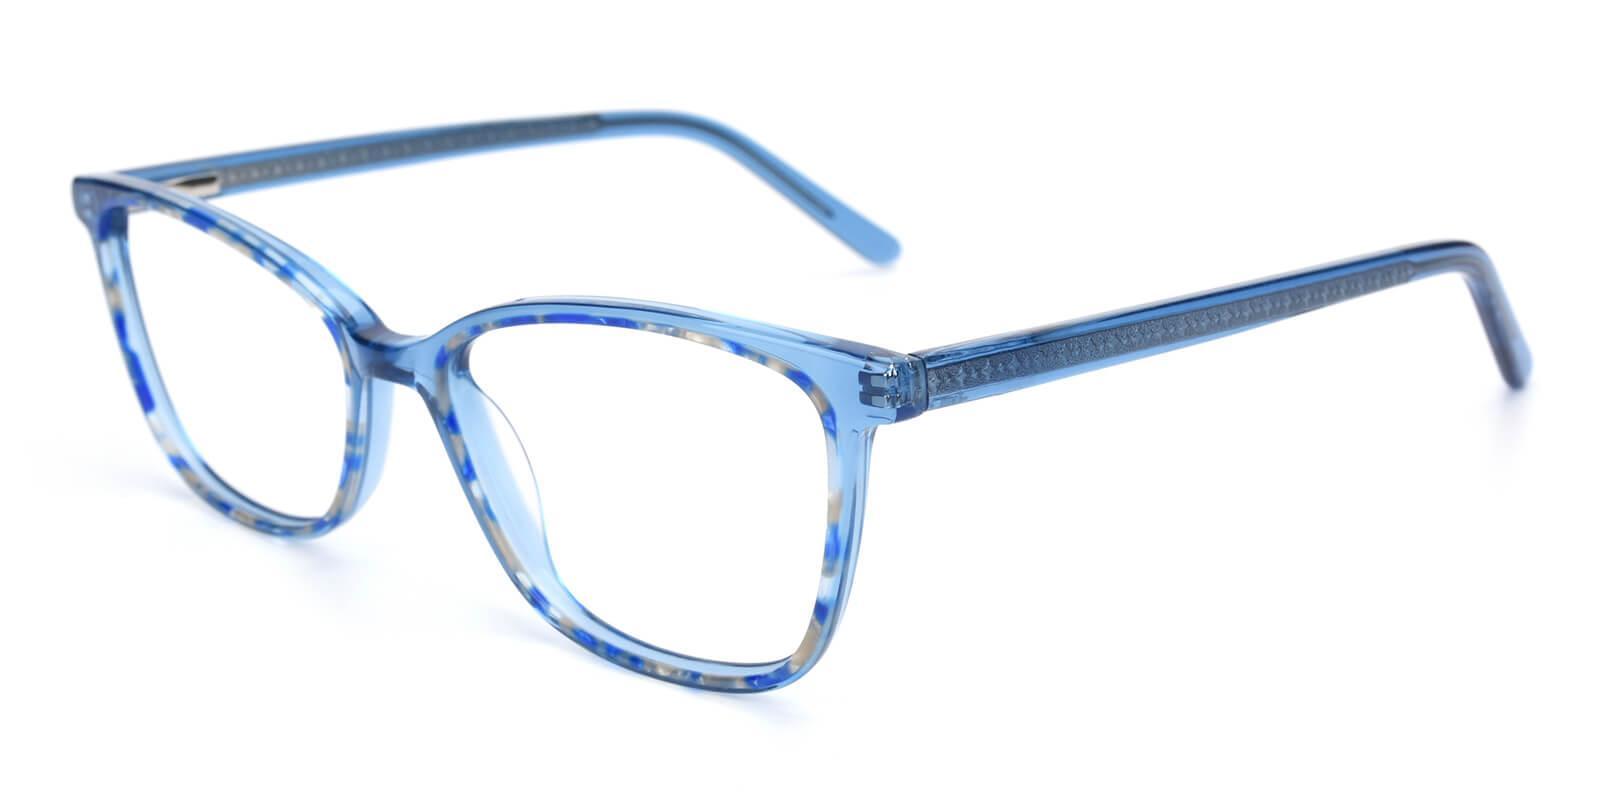 Darleney-Blue-Cat-Acetate-Eyeglasses-additional1